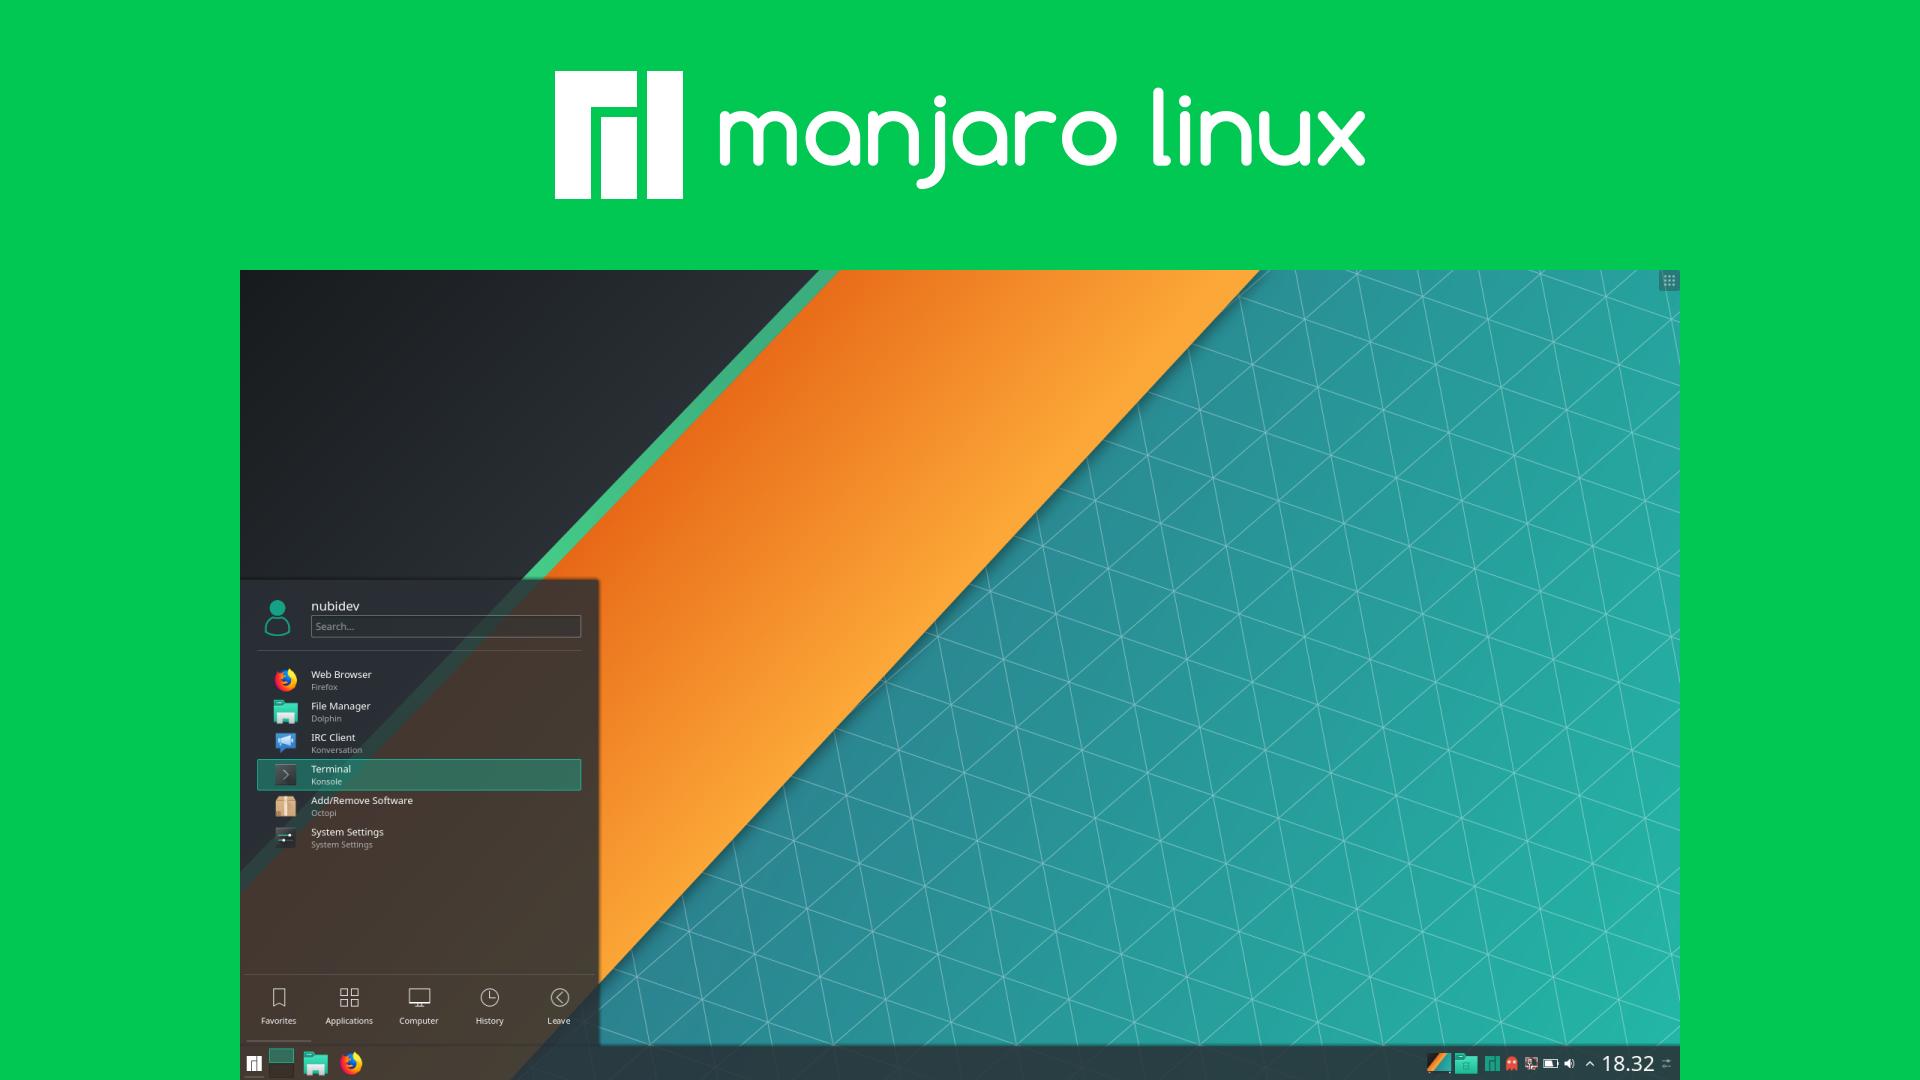 Manjaro Distro Linux Elegant berbasis Arch Linux - Nubidev